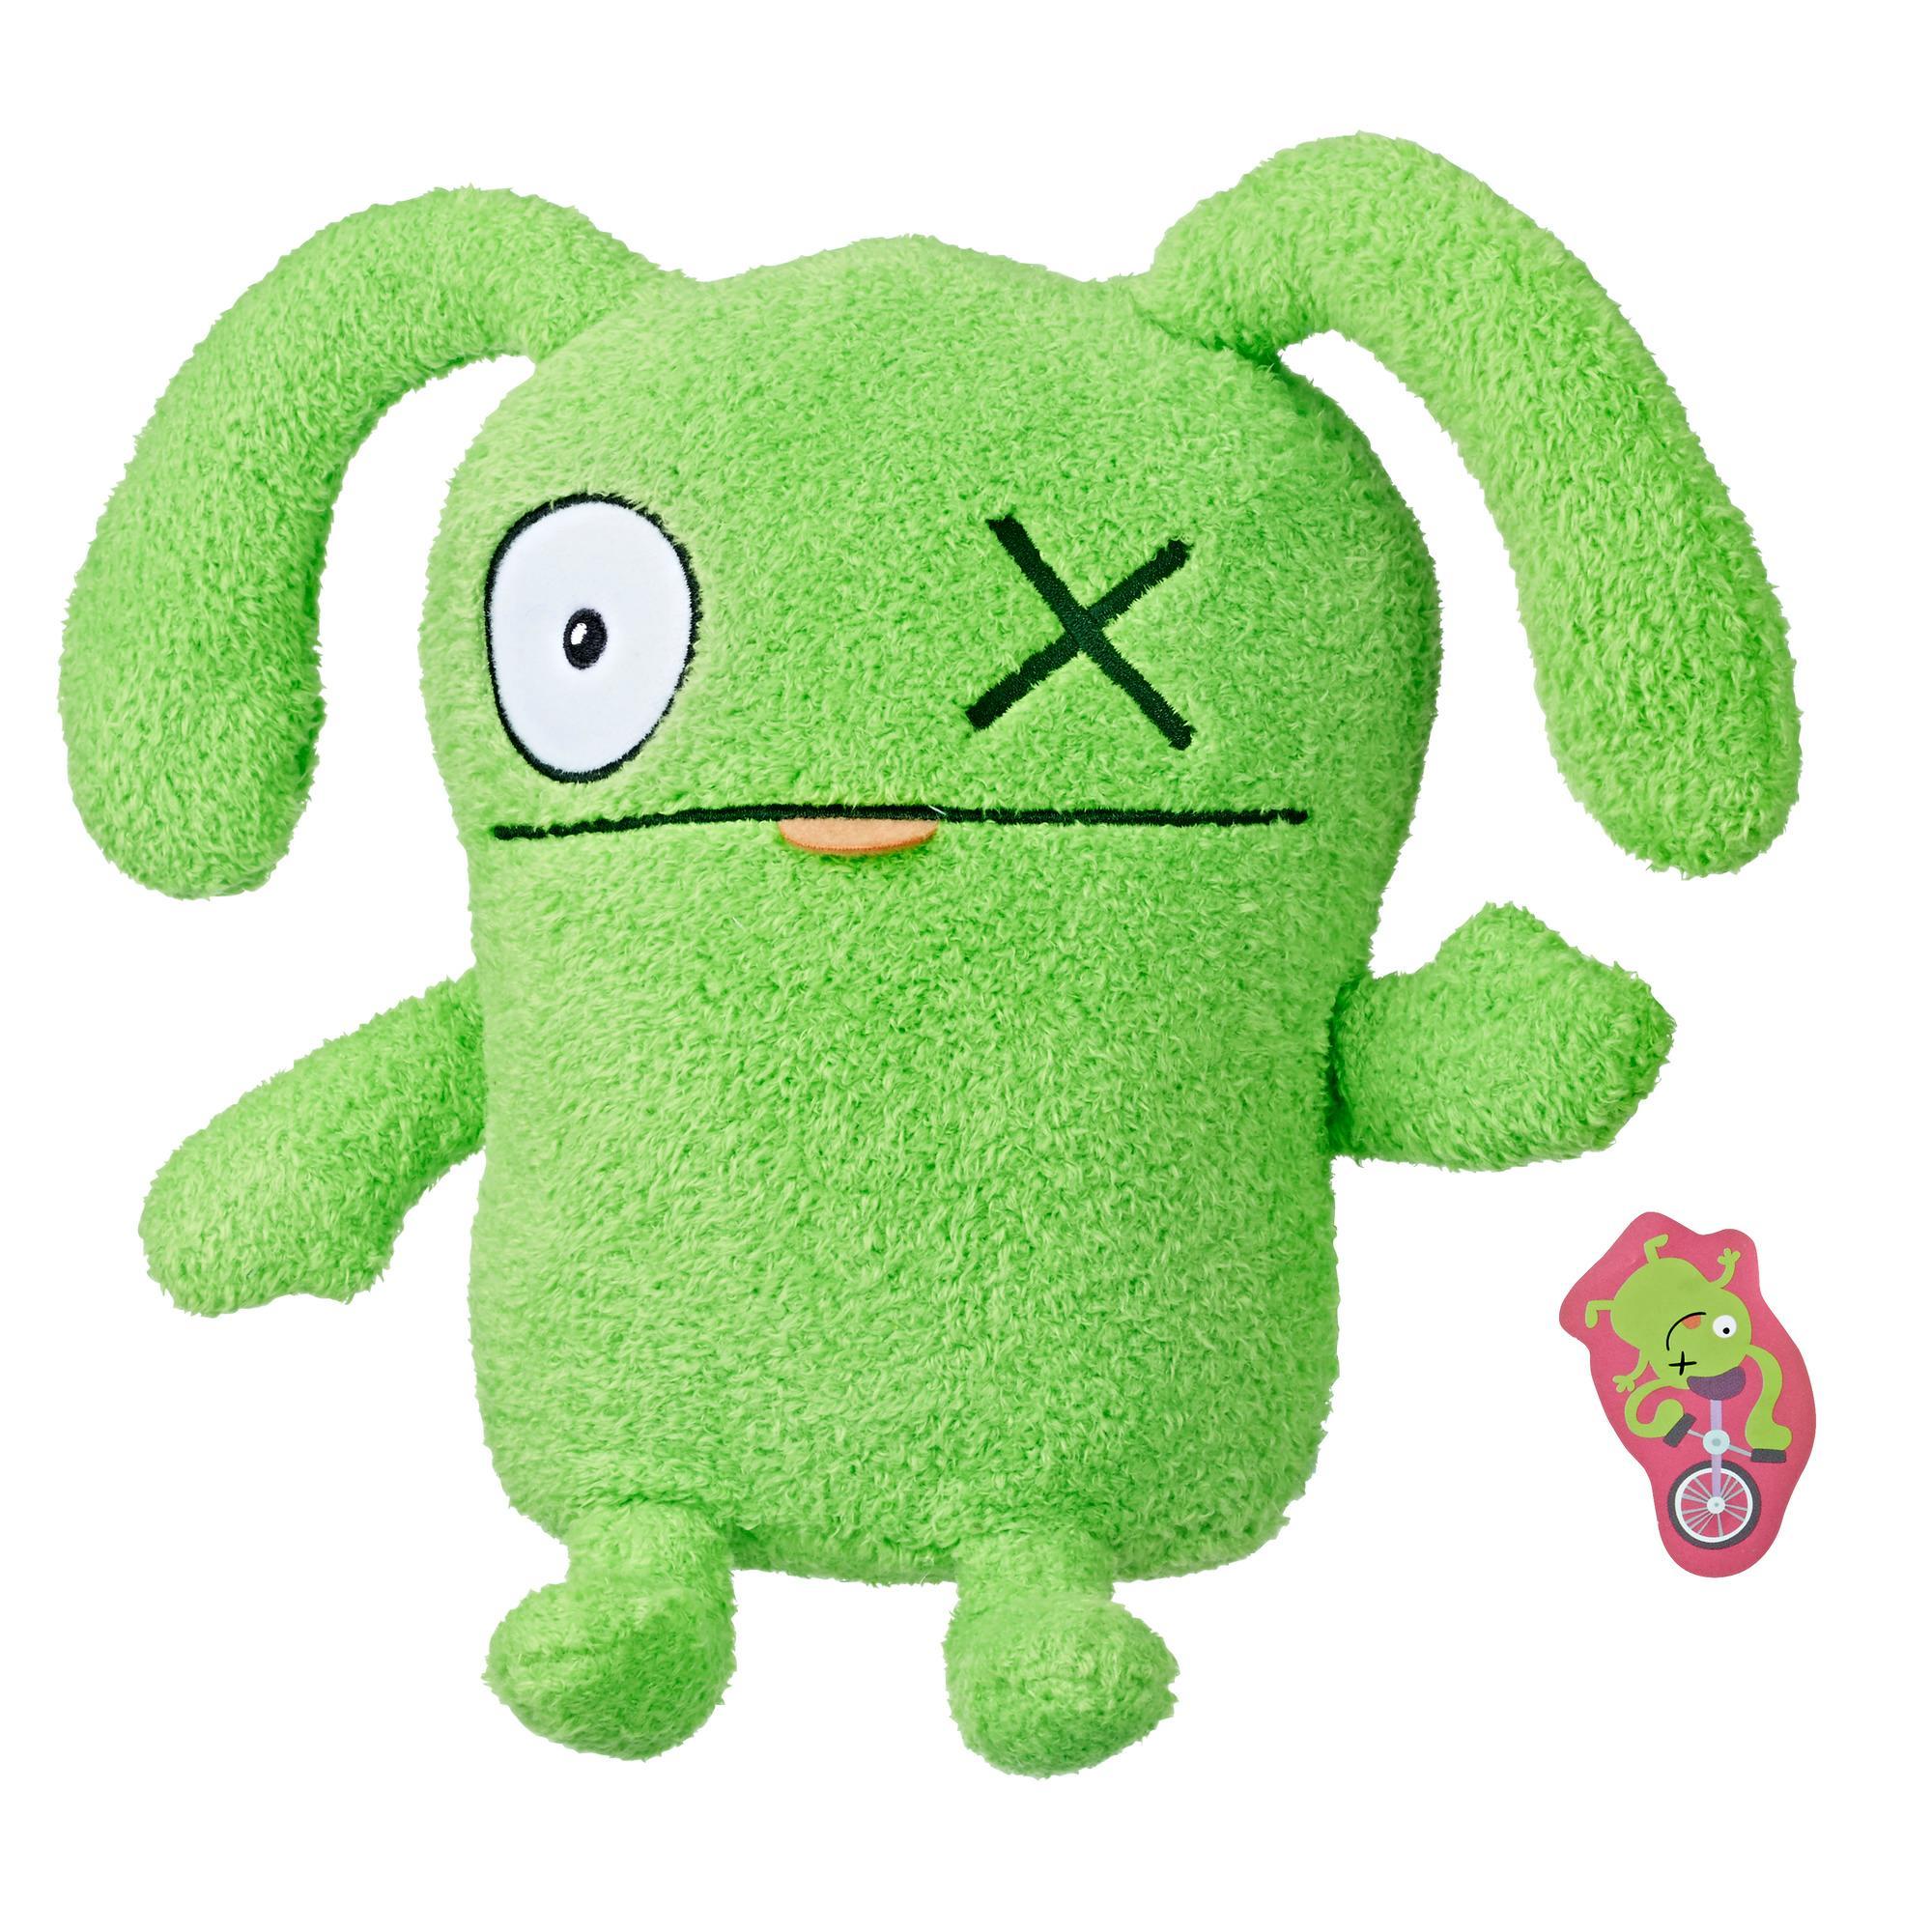 UglyDolls Jokingly Yours OX Stuffed Plush Toy, 23,5 cm. tall